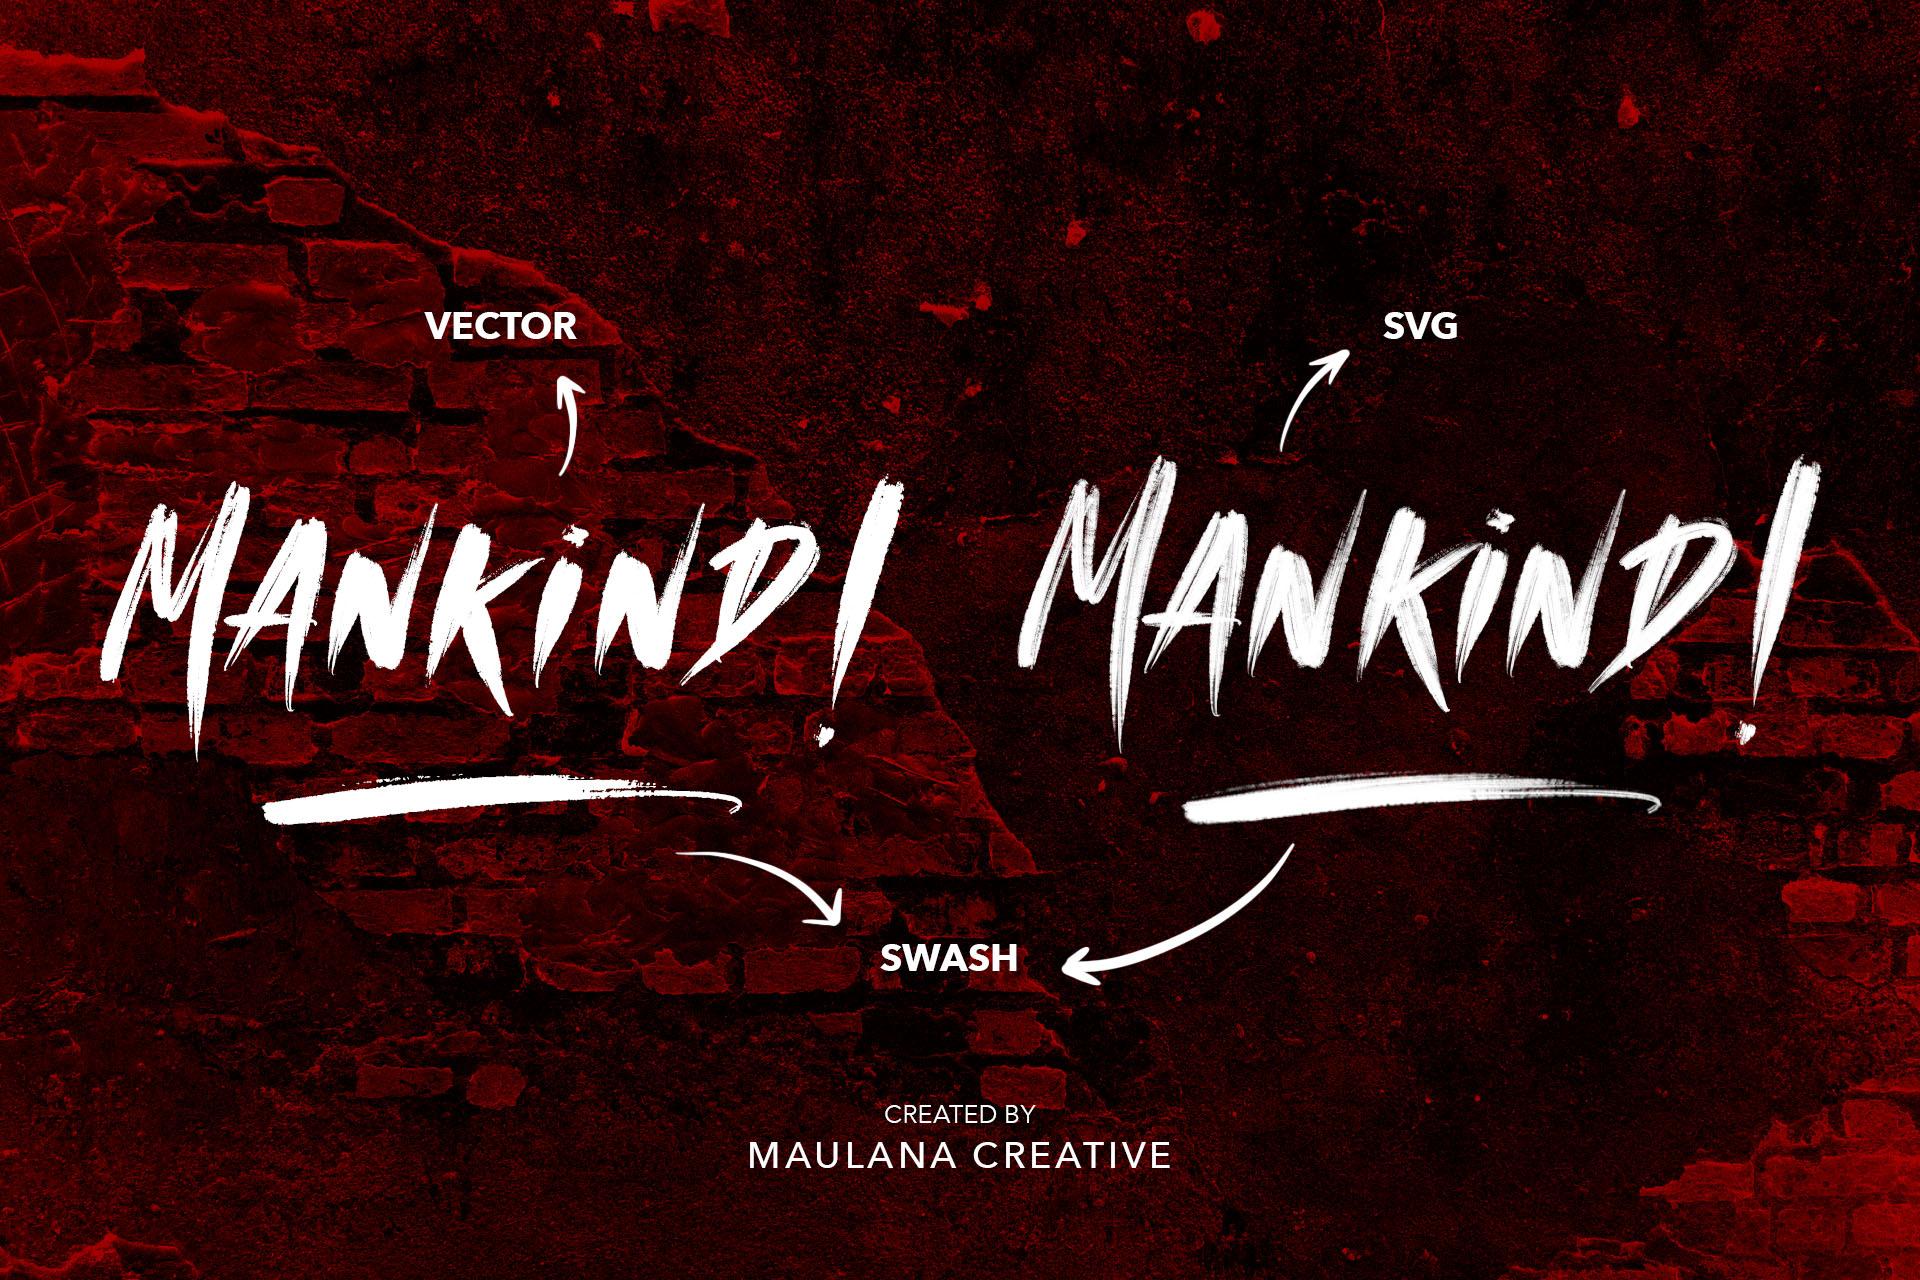 MANKIND - SVG Brush Font example image 2